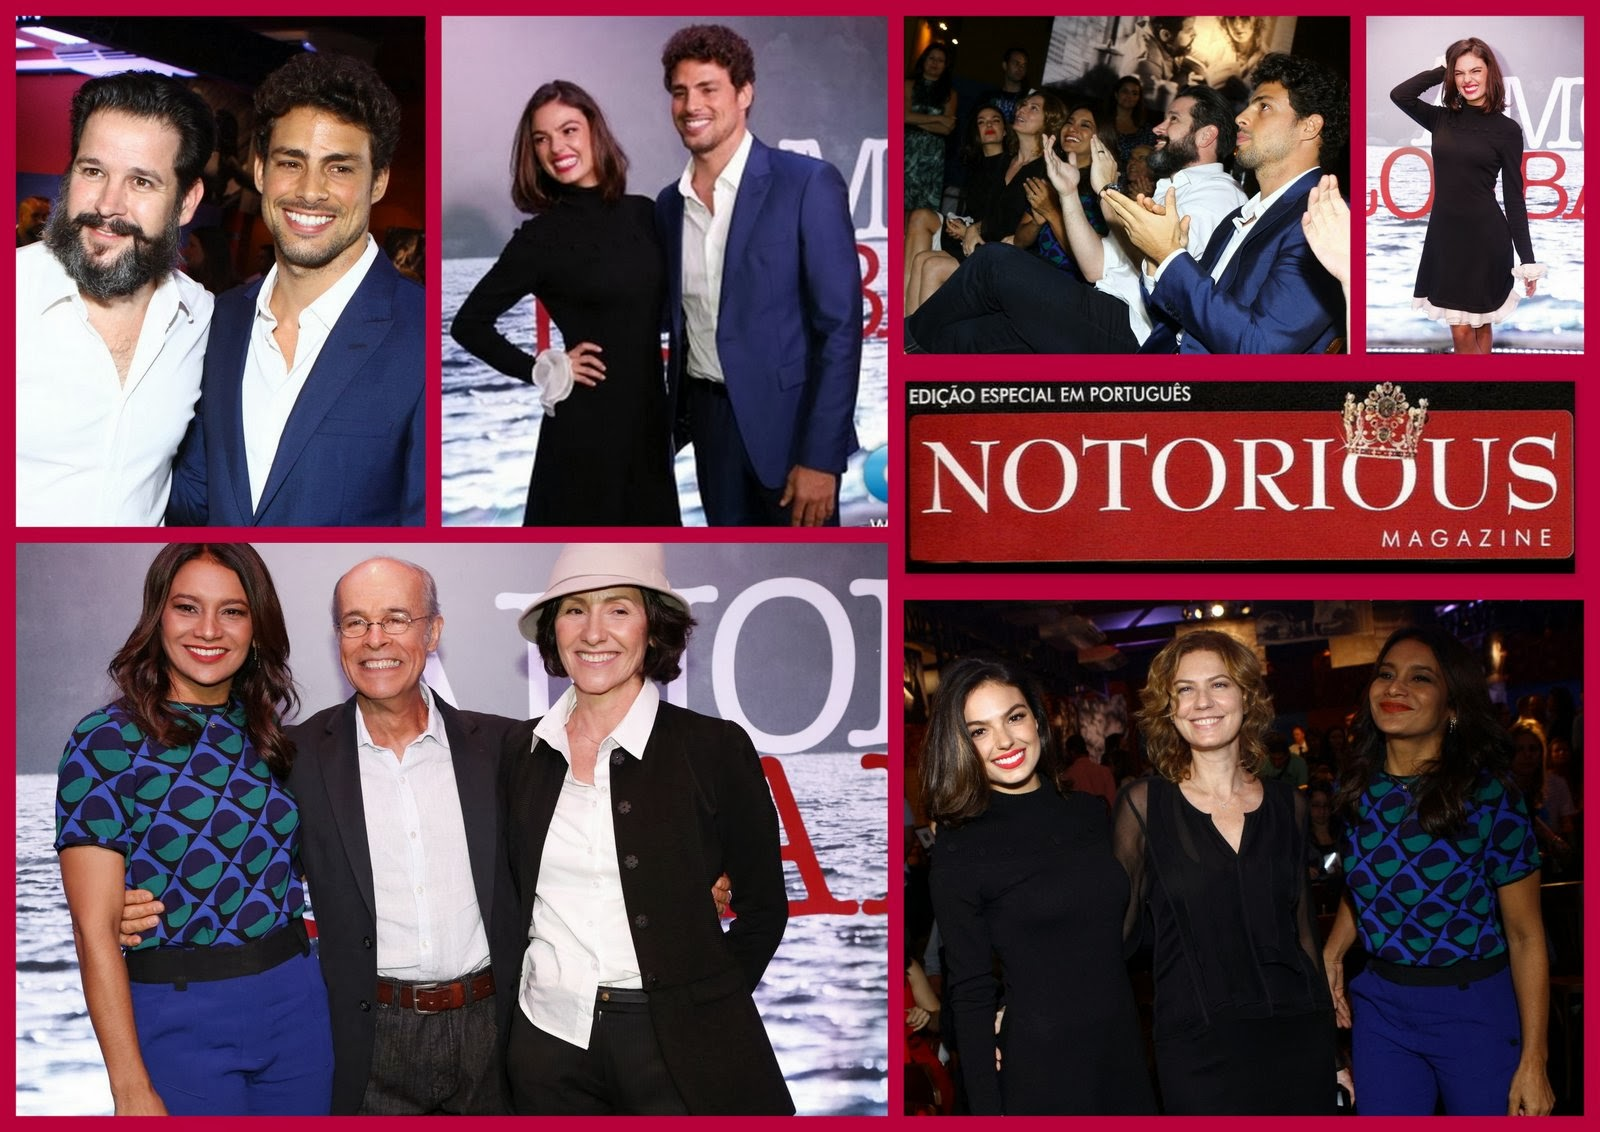 Amores Roubados notorious magazinevanderlan nader: amores roubados: cauÃ